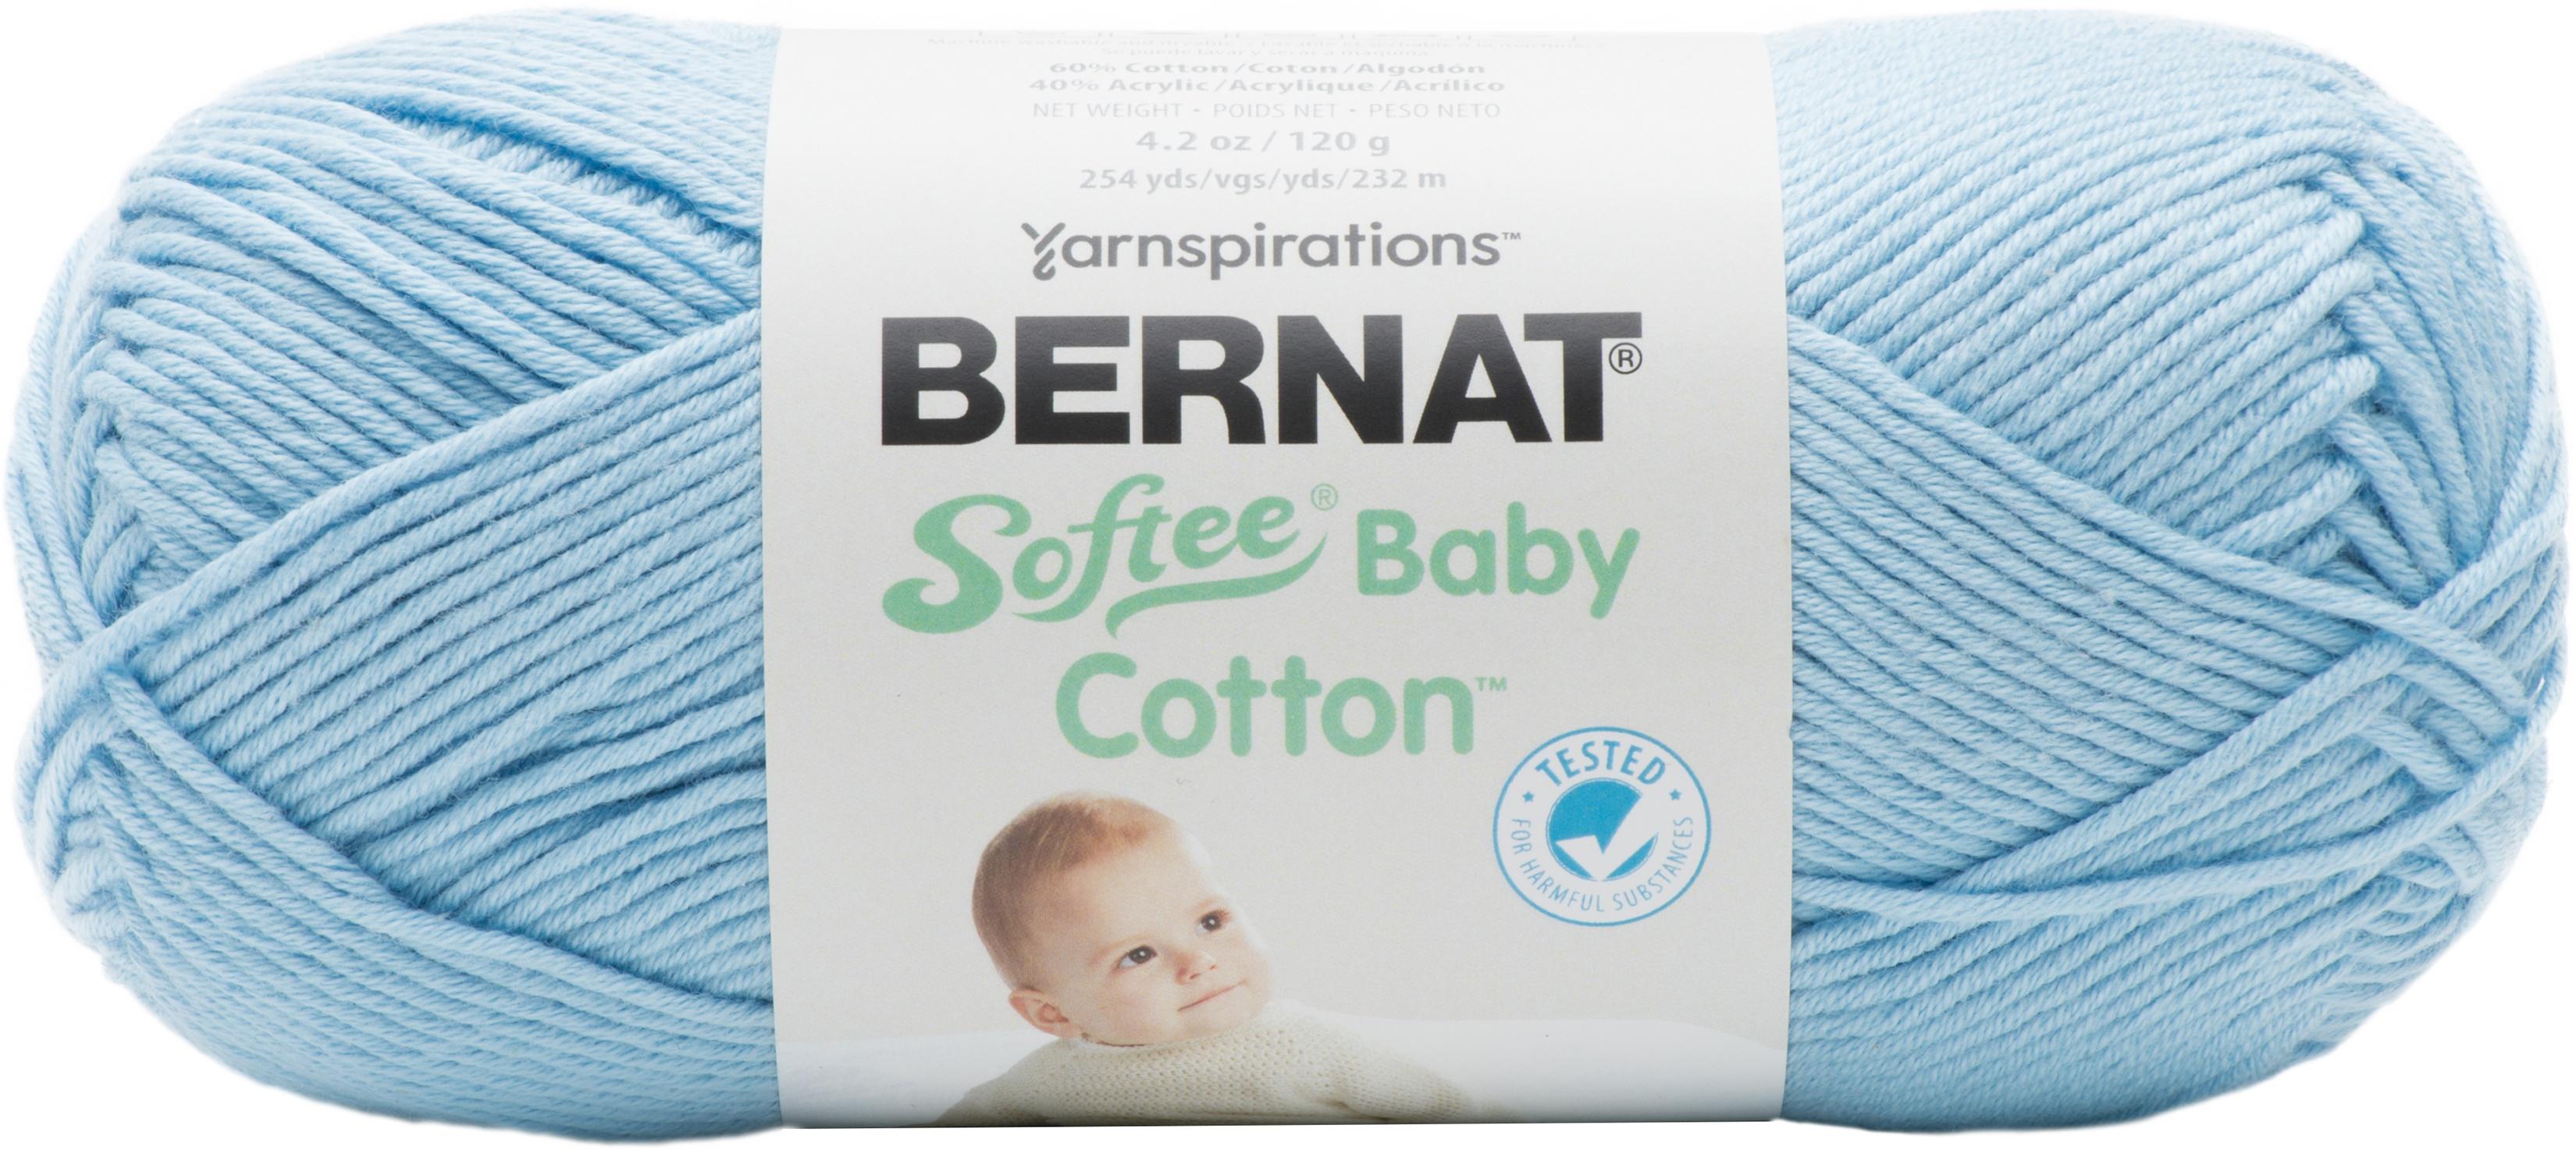 Bernat Softee Baby Cotton Yarn-Dusky Sky